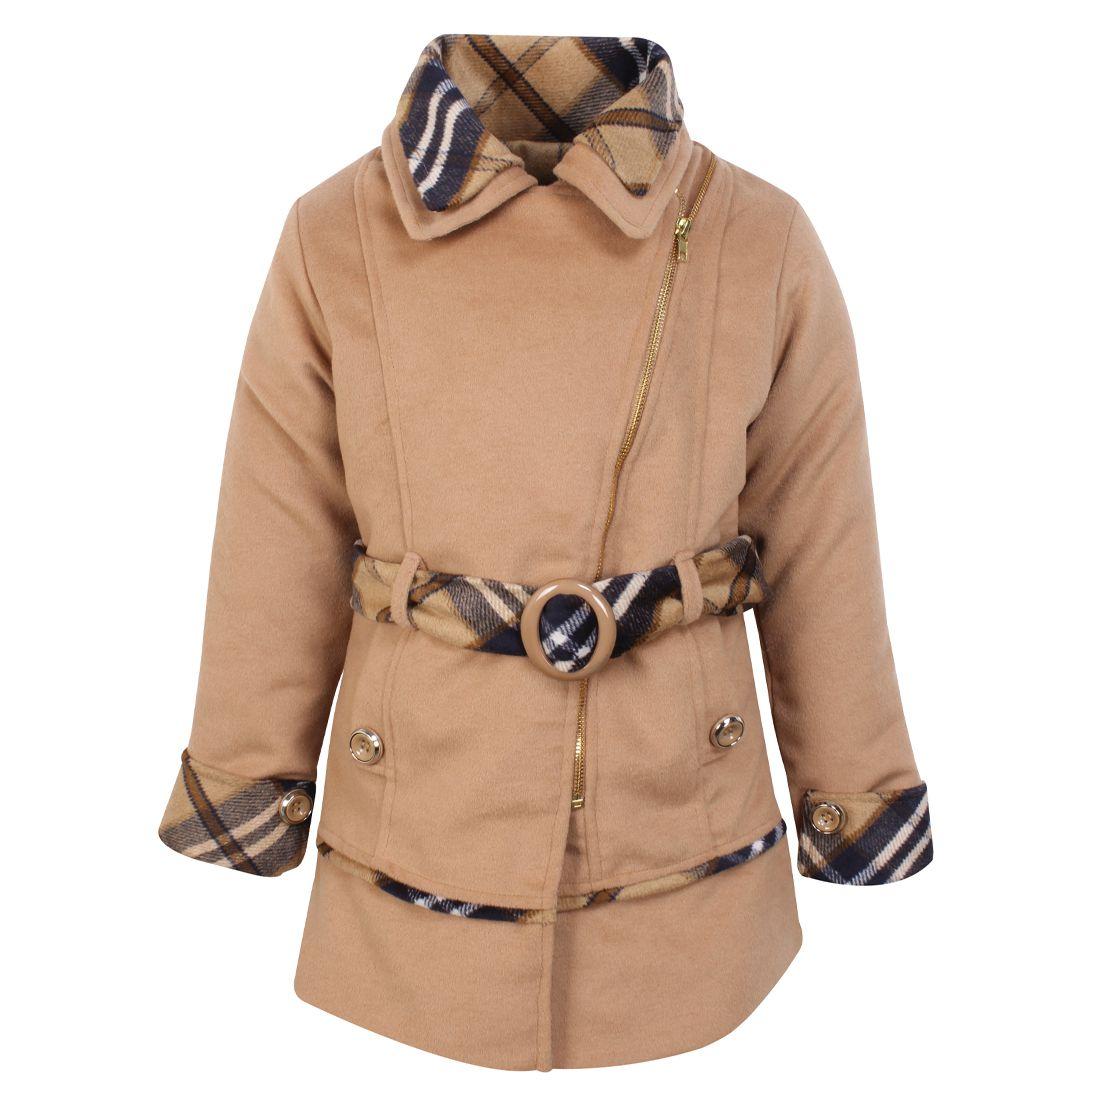 Cutecumber Girls Partywear Heavy Winter Coat Fabric Jacket